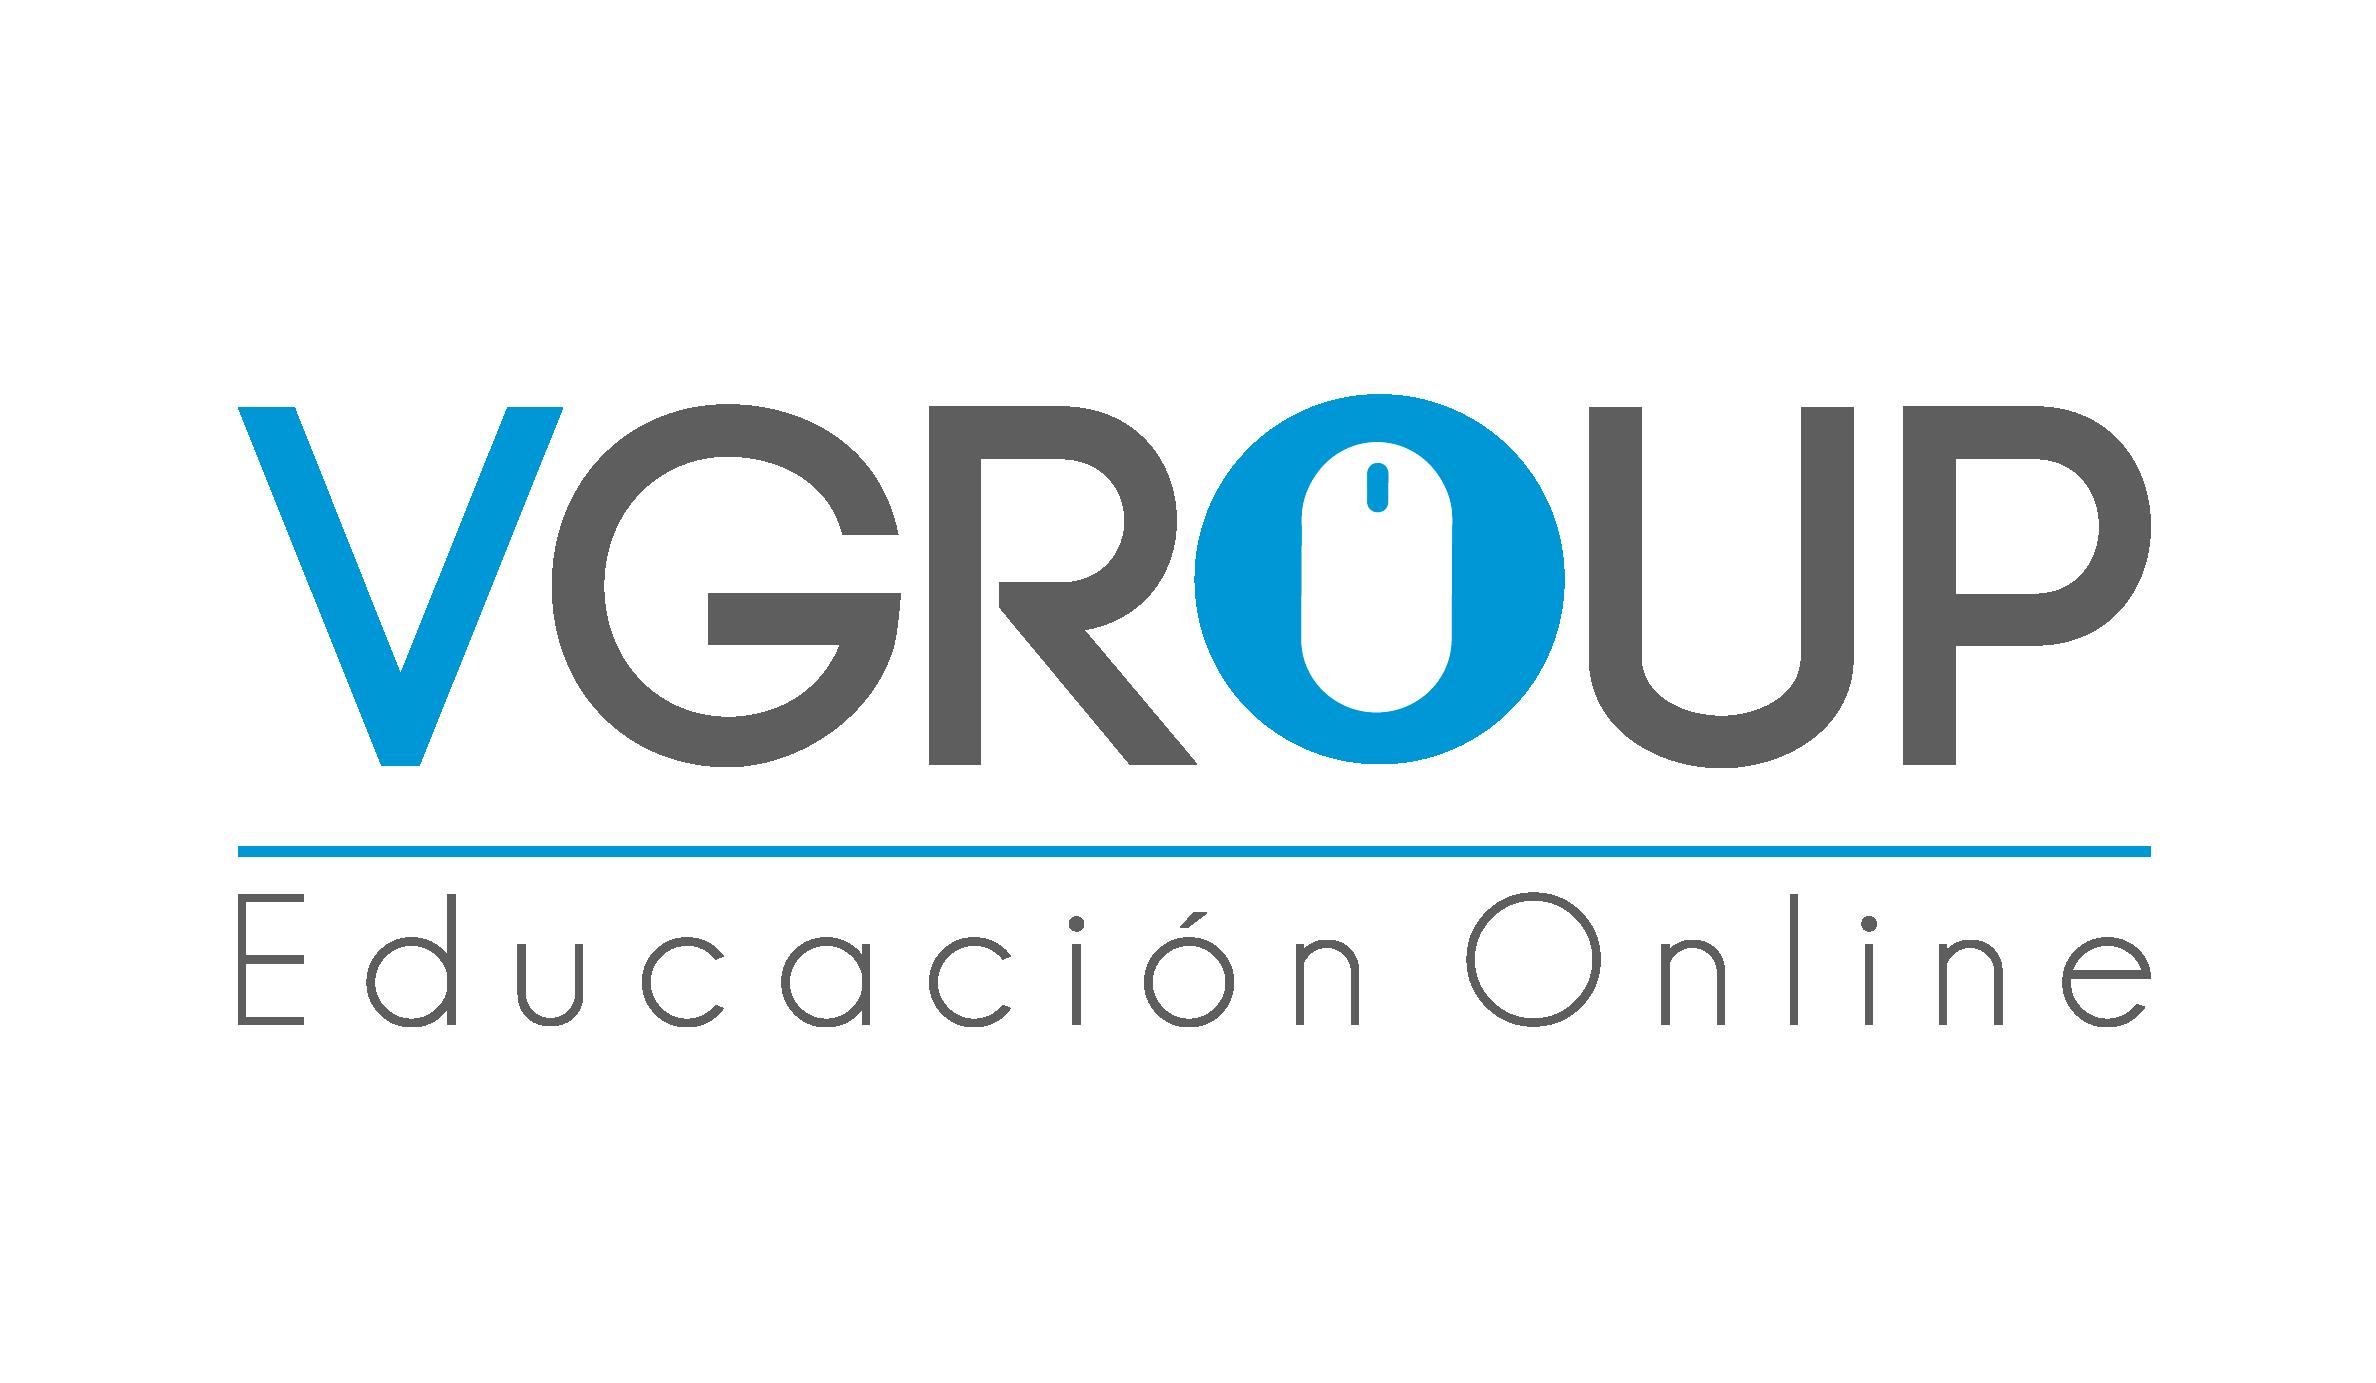 Logo vgroup